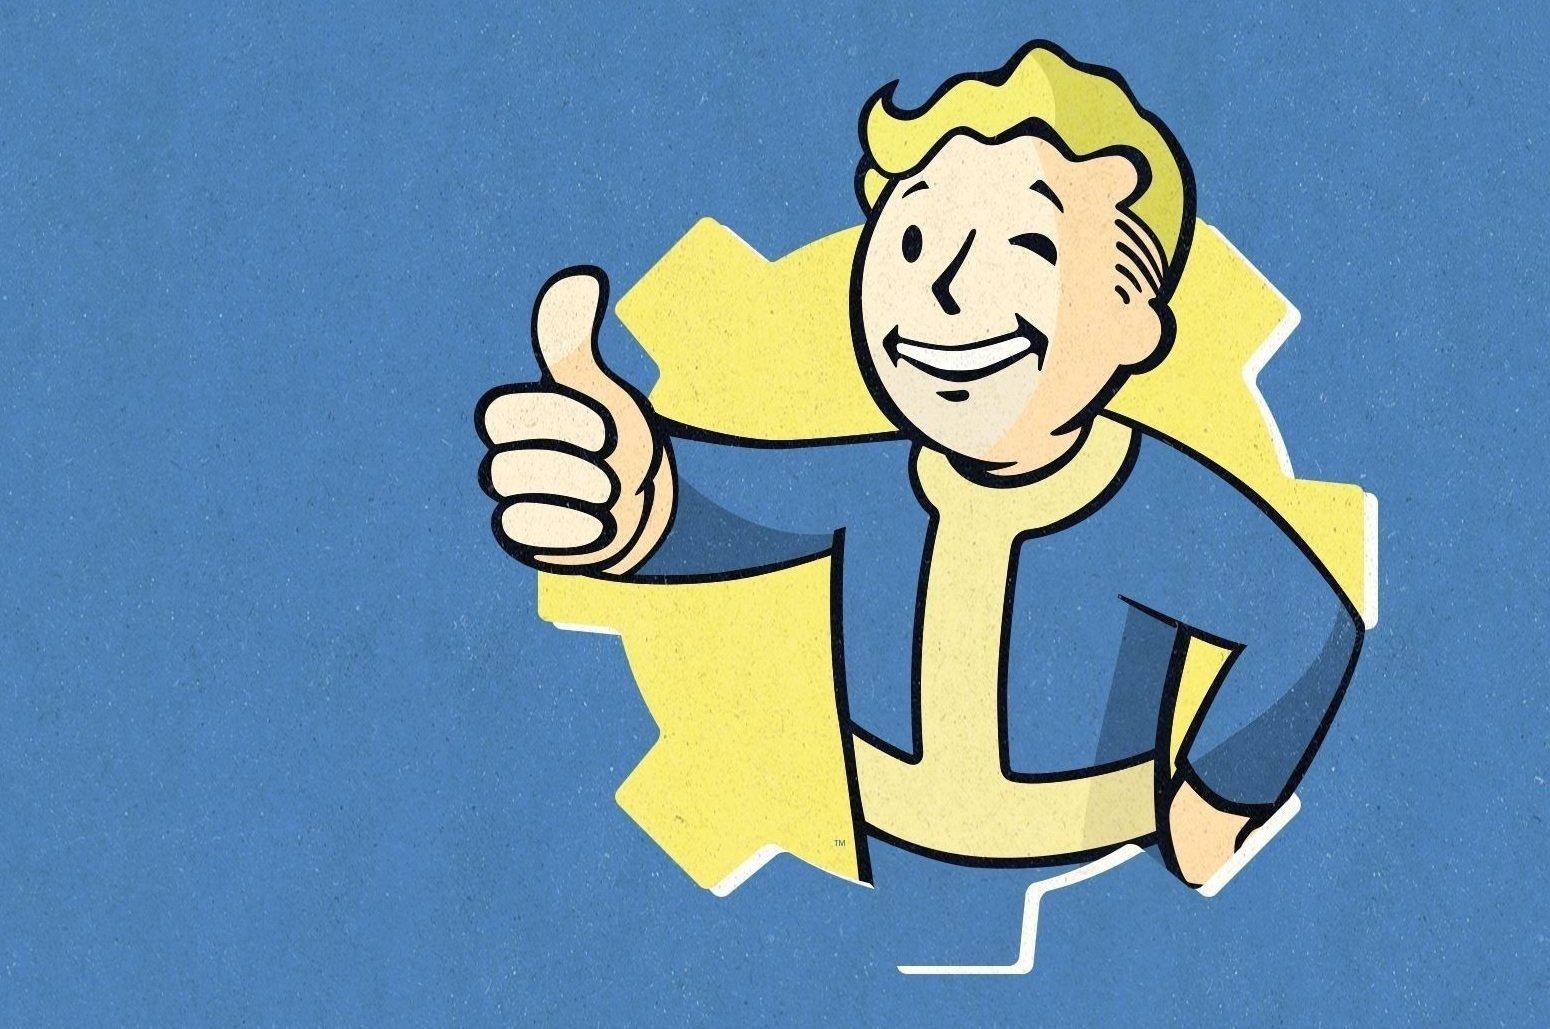 Bethesda tweets Fallout announcement teaser